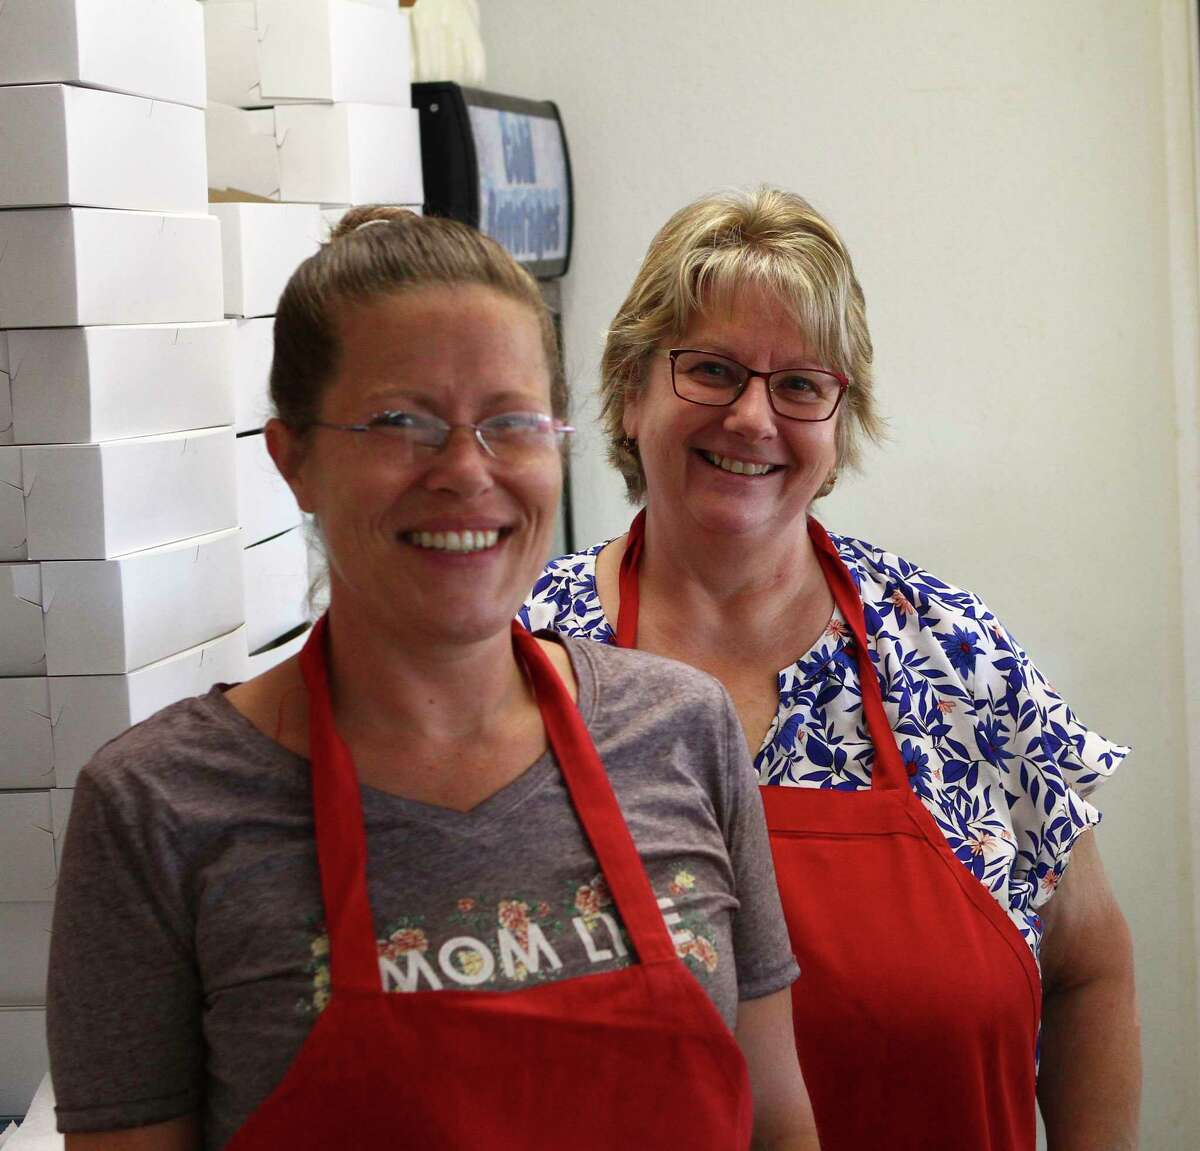 VanBrocklin's Bakery assistant Marla Kosinski (left) and owner Lynne VanBrocklin smile behind the counter on Thursday morning. (Pioneer photo/Joe Judd)